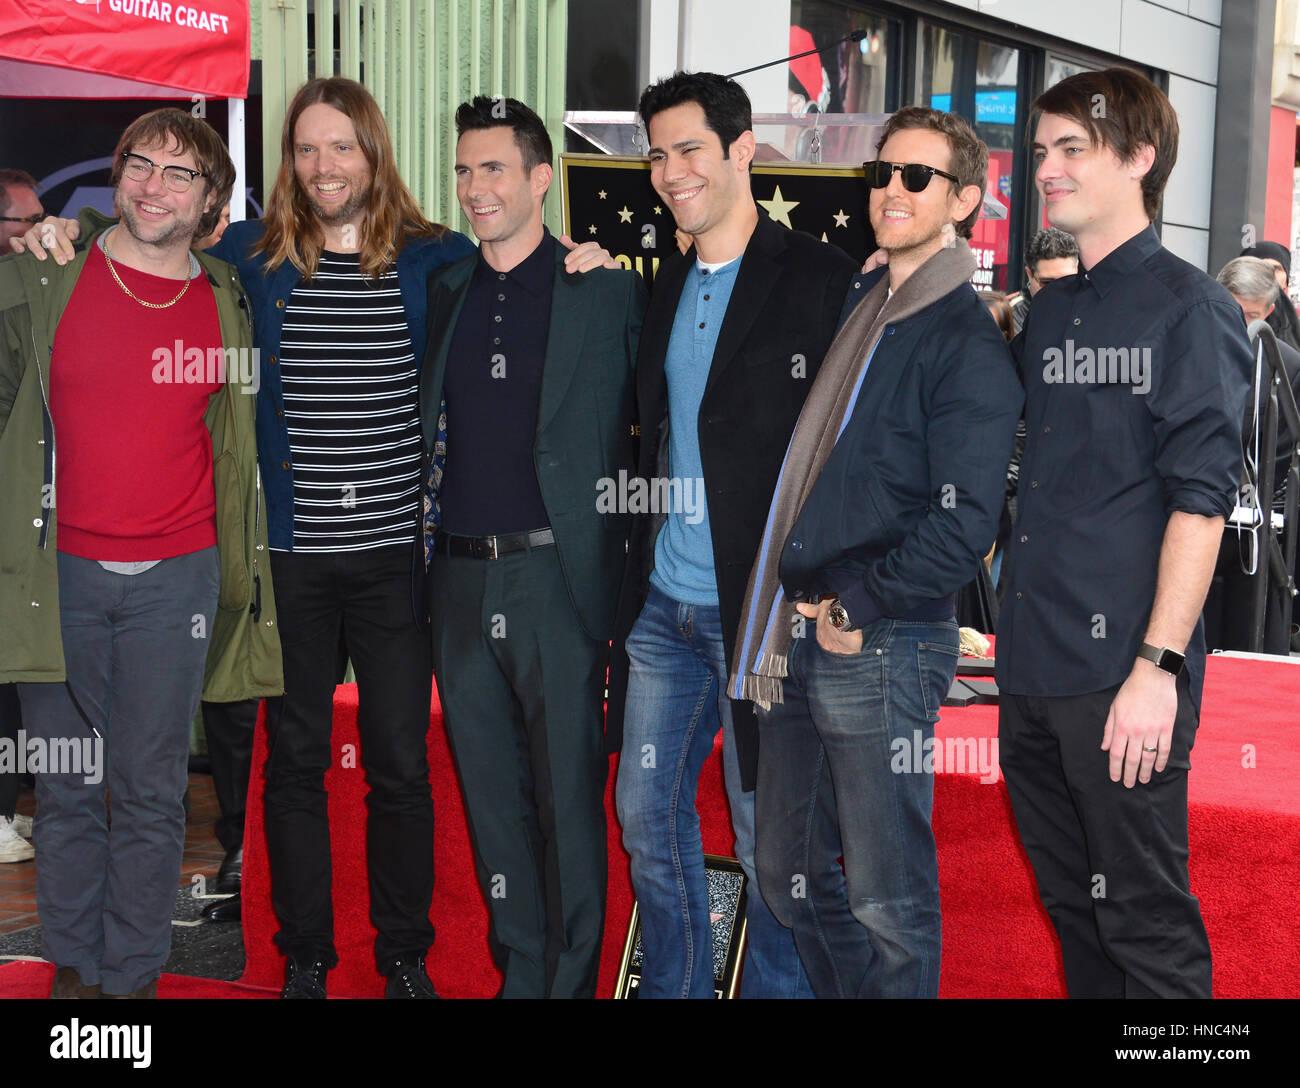 Band Maroon 5 Stock Photos & Band Maroon 5 Stock Images - Alamy